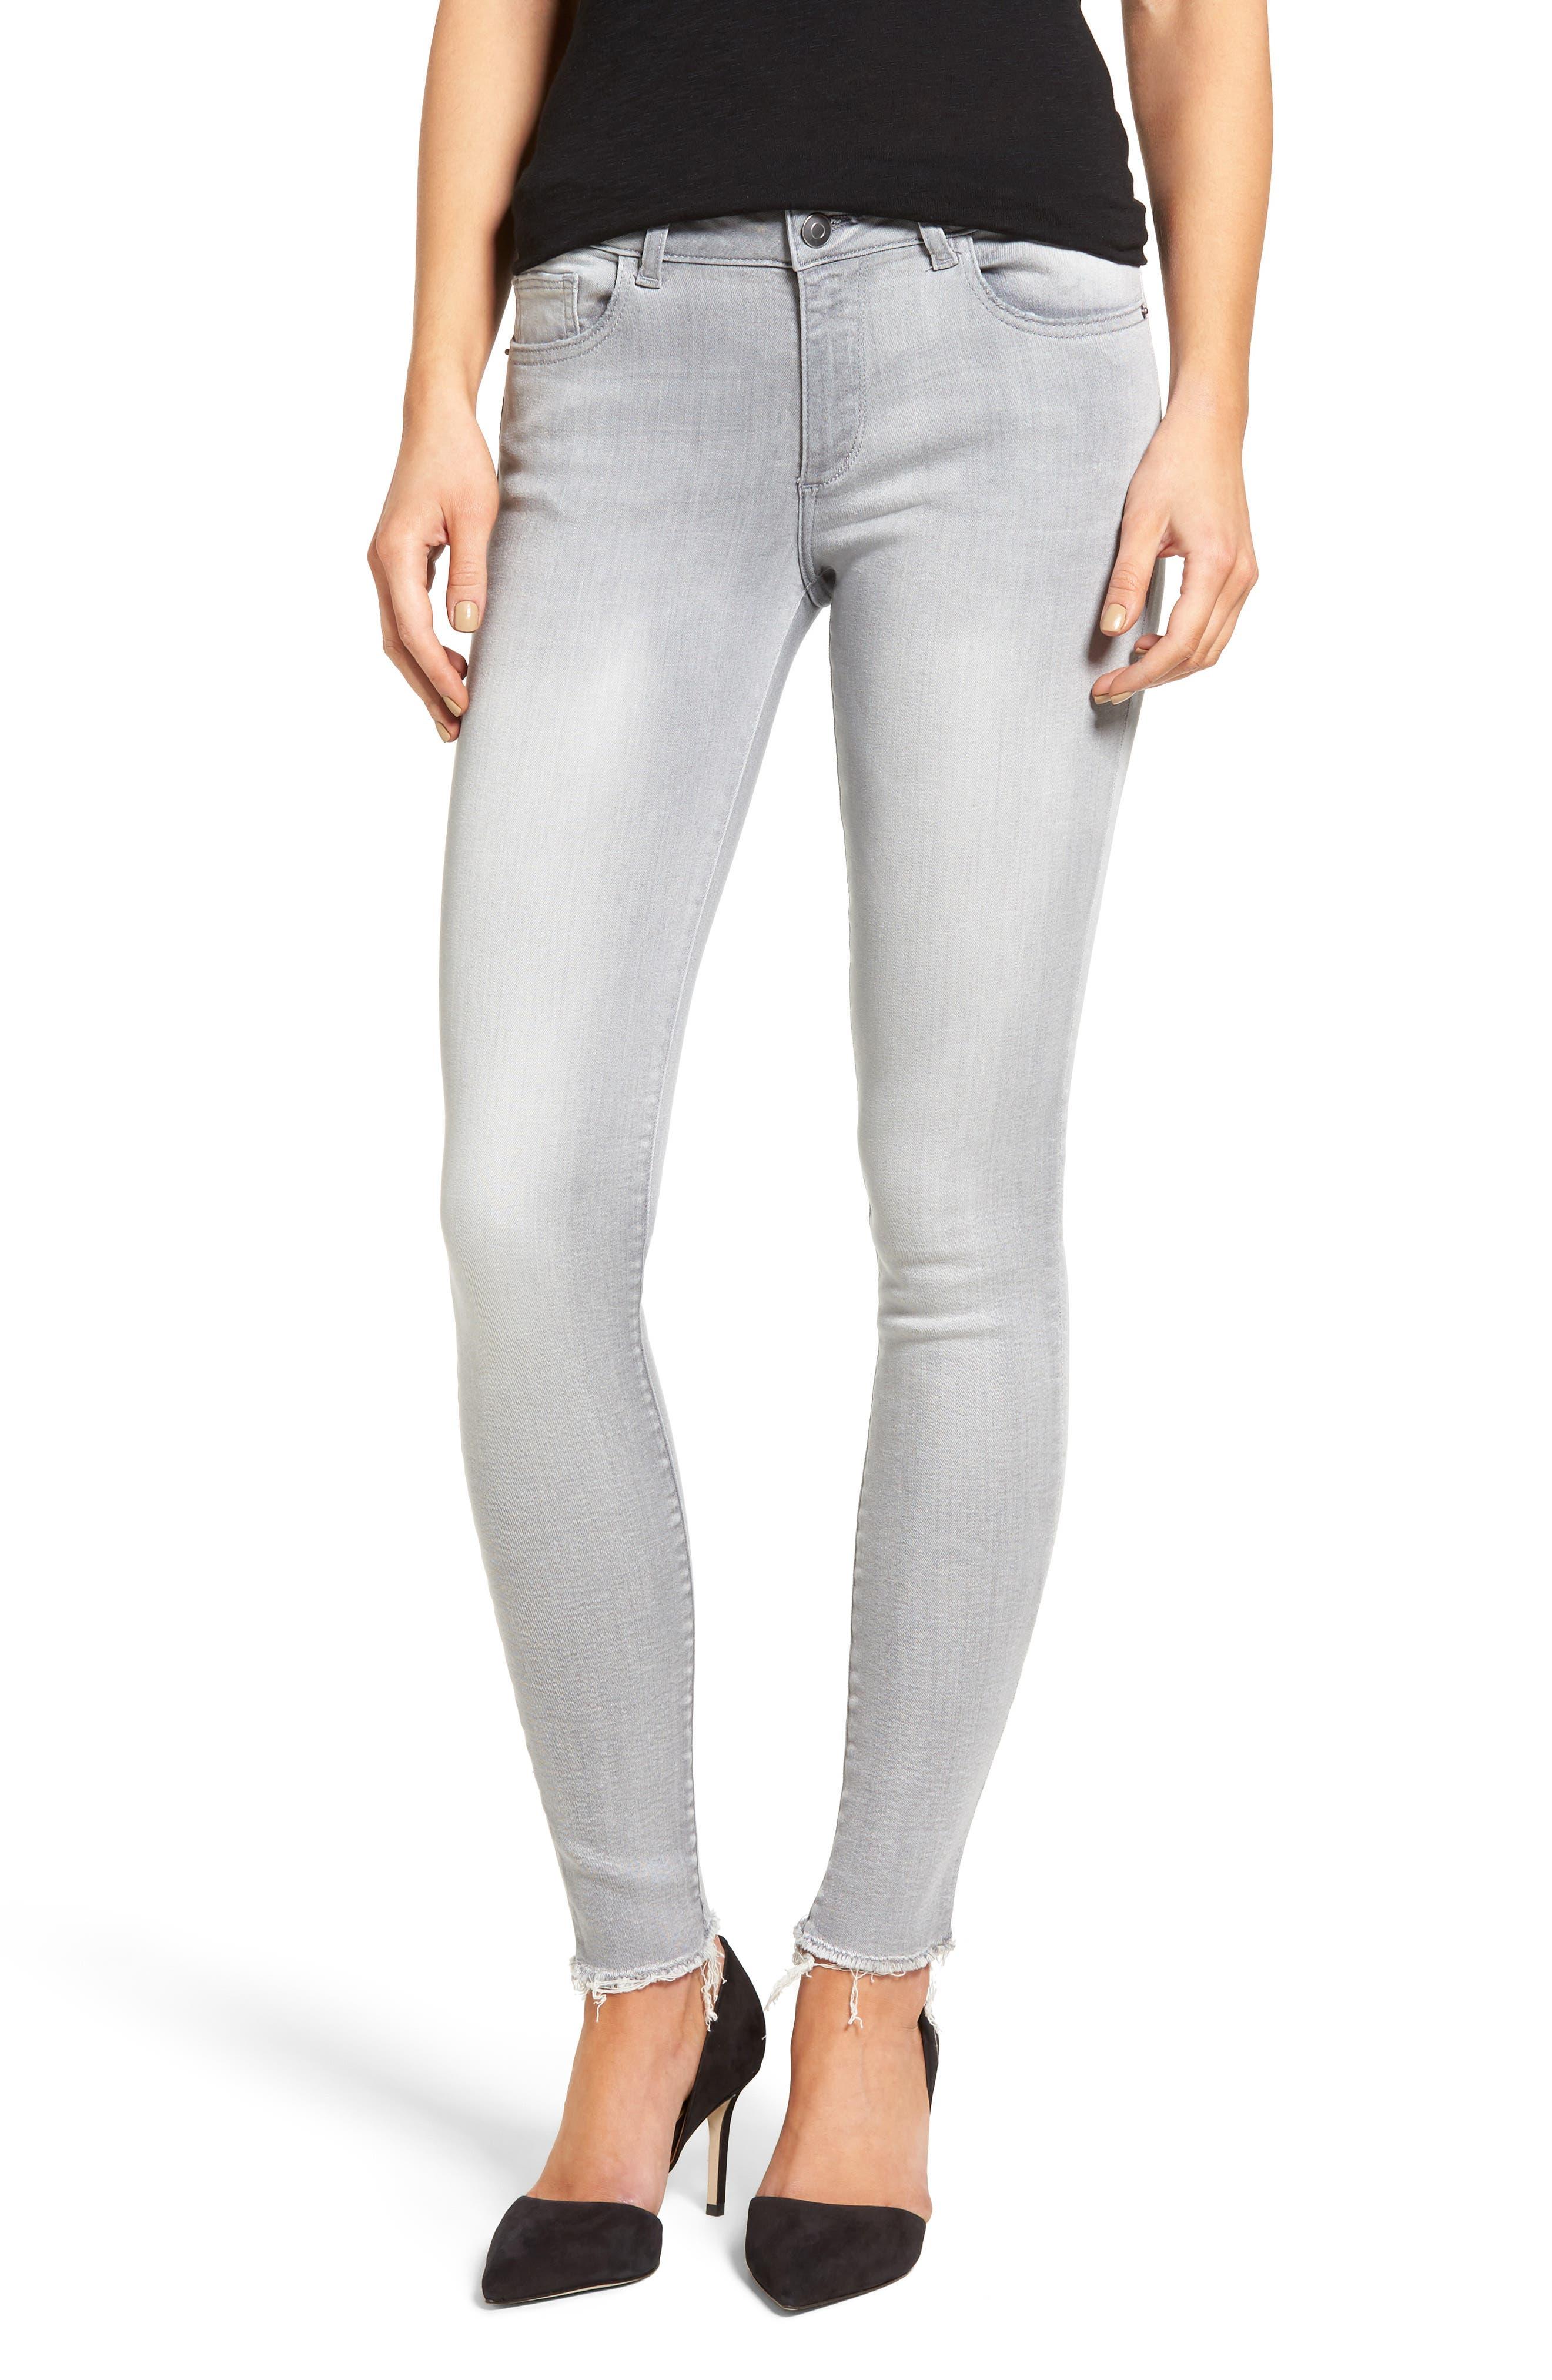 Emma Power Legging Jeans,                             Main thumbnail 1, color,                             020